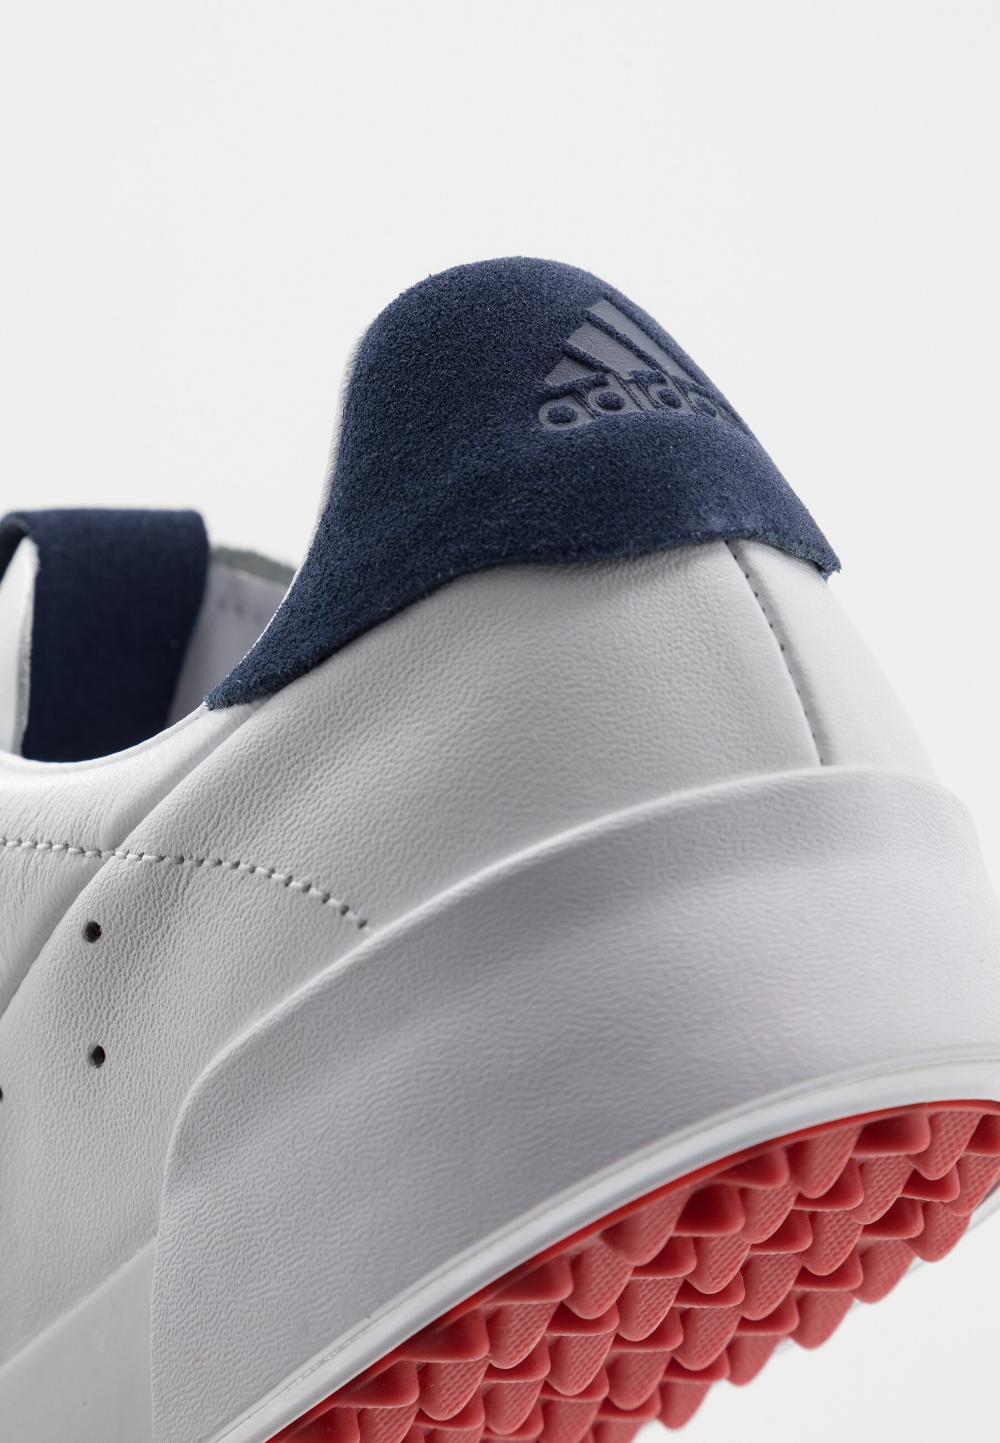 Adidas Golf Adicross Retro Golfschoenen Footwear White Silver Metallic Tech Indigo Wit Zalando Nl Golfschoenen Herenmode Sportschoenen